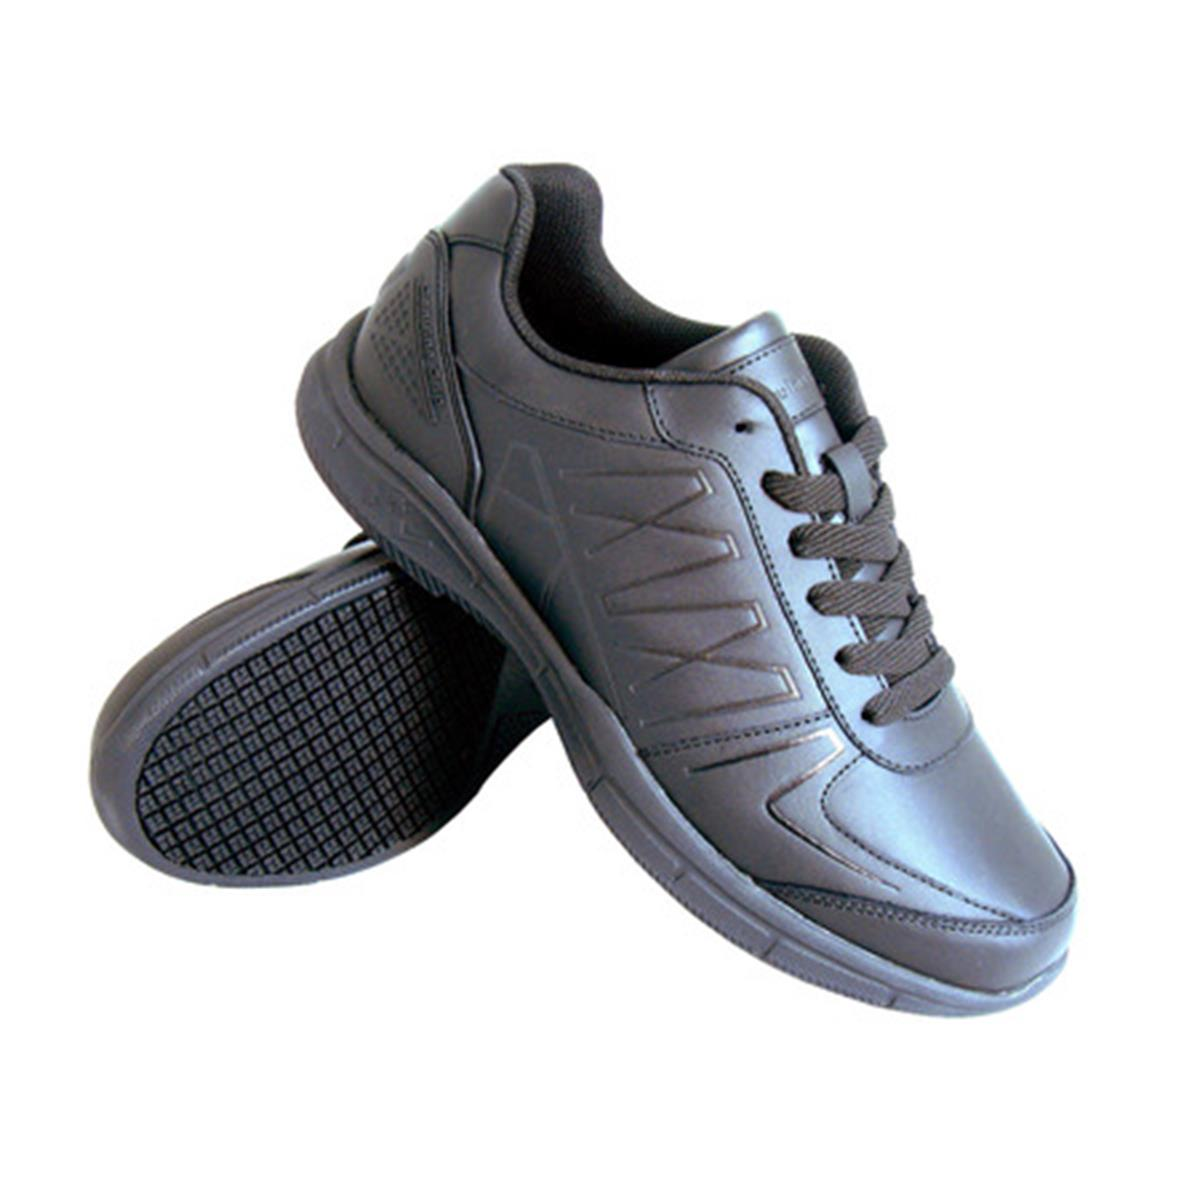 Genuine Grip Men's Athletic Shoes-Genuine Grip